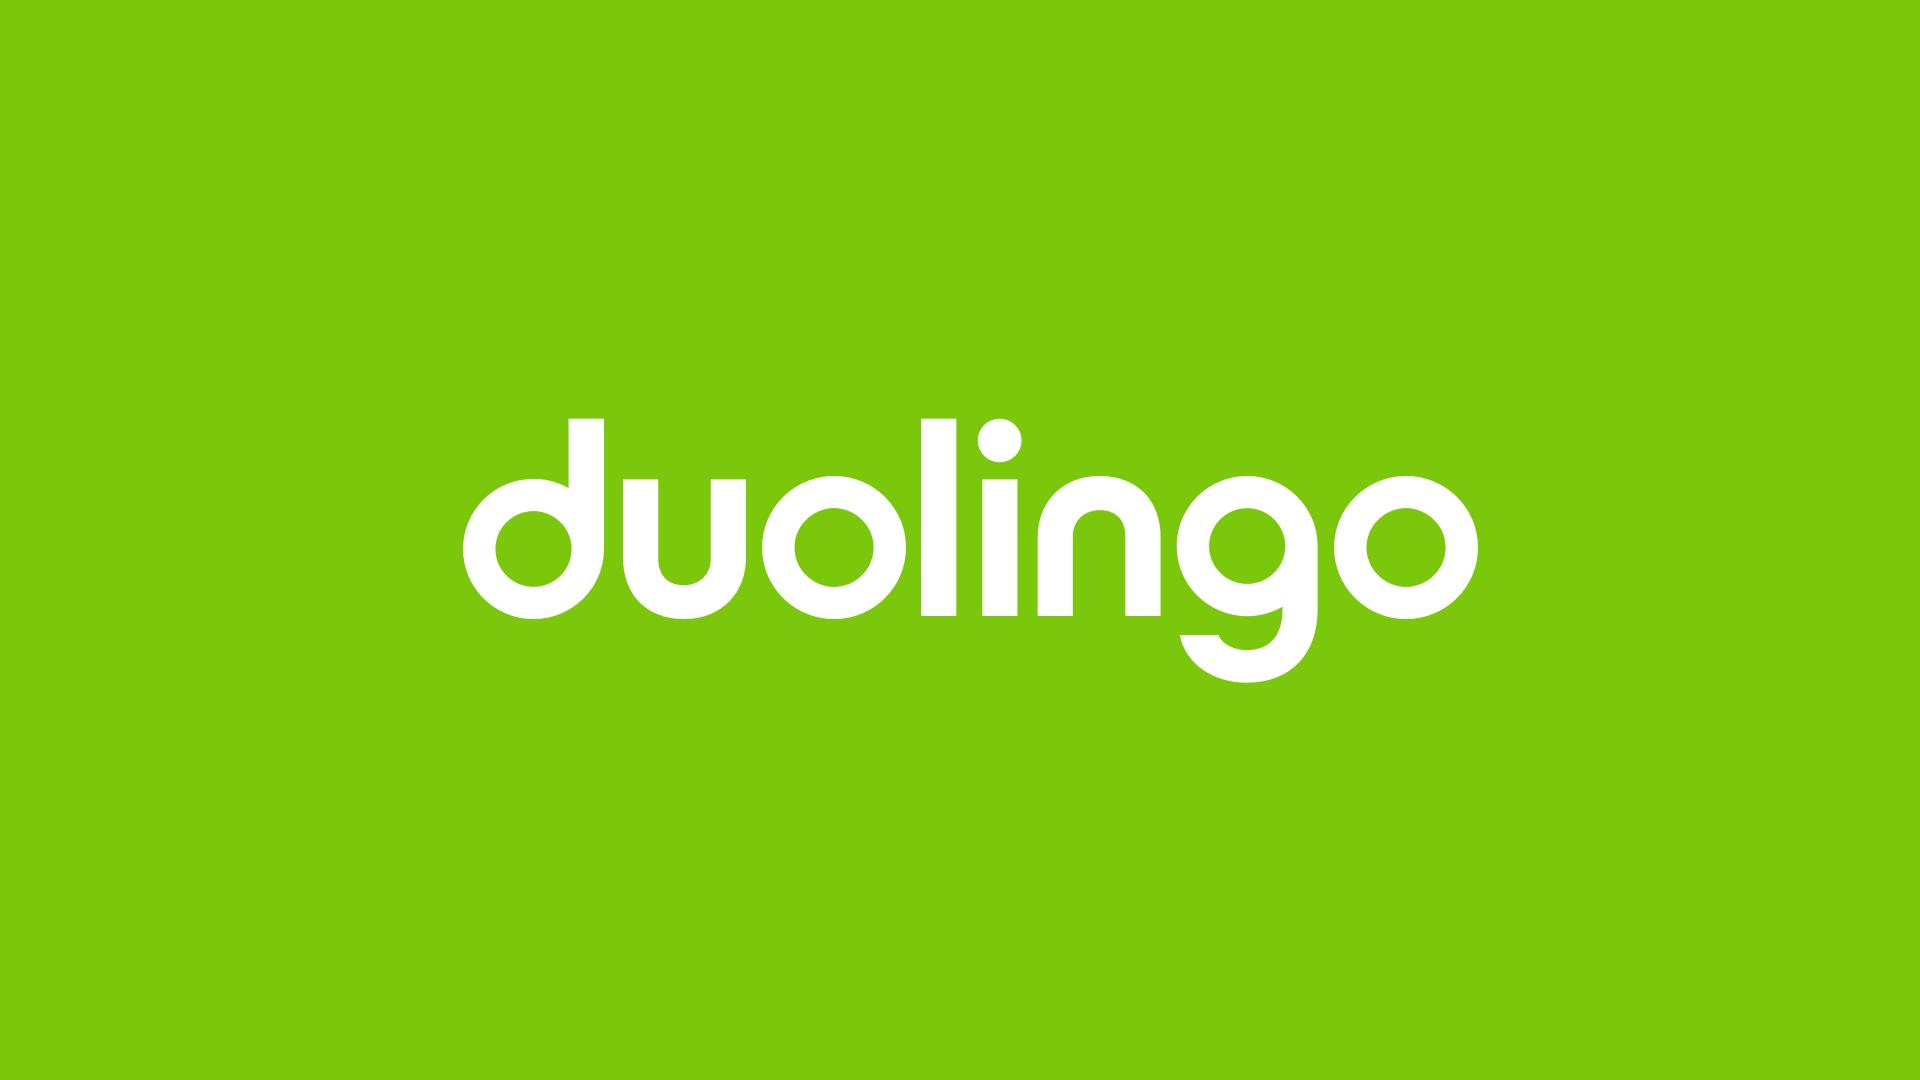 Duolingo Logo by Jack Morgan